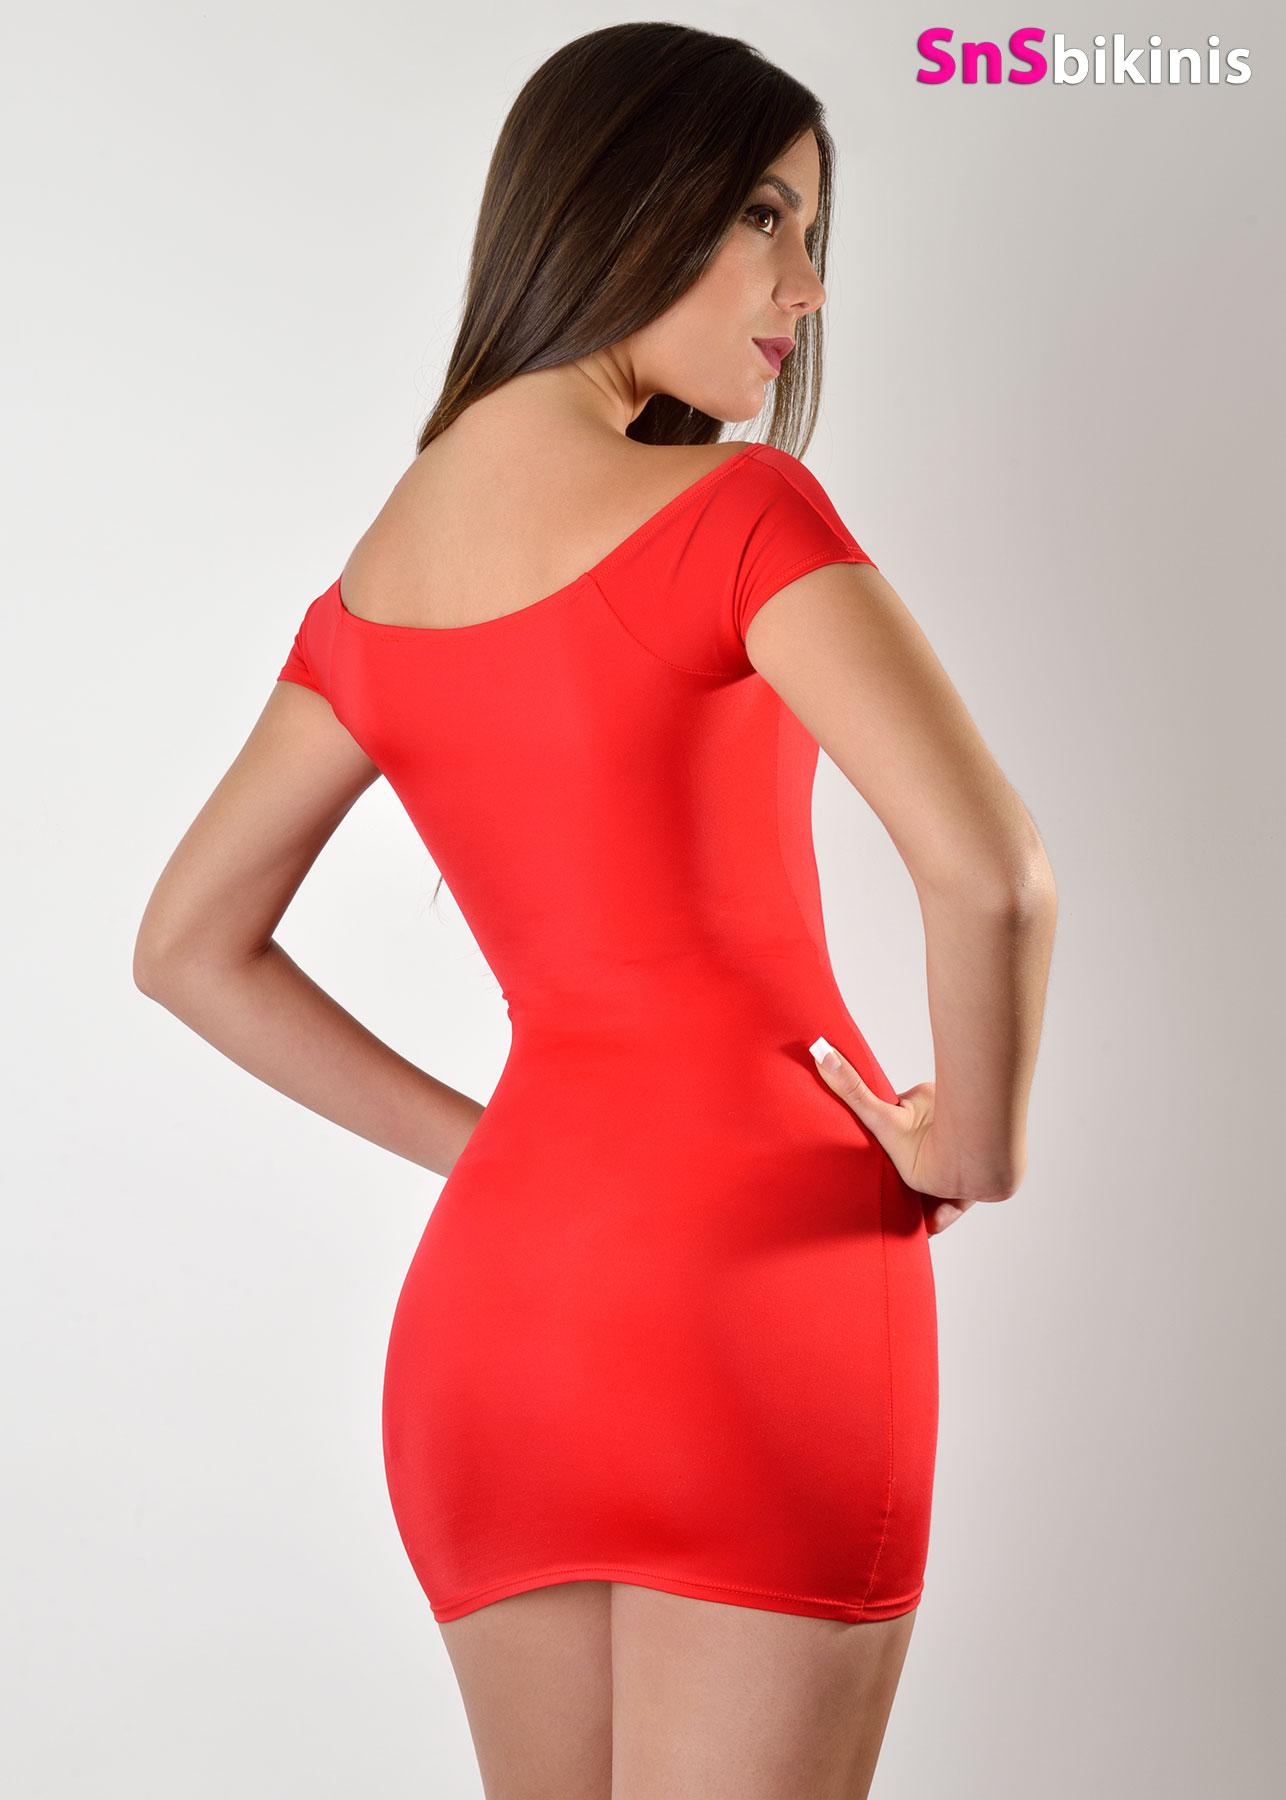 Sabrina Sexy Mini Dress Shbr002 81 00 Snsbikinis